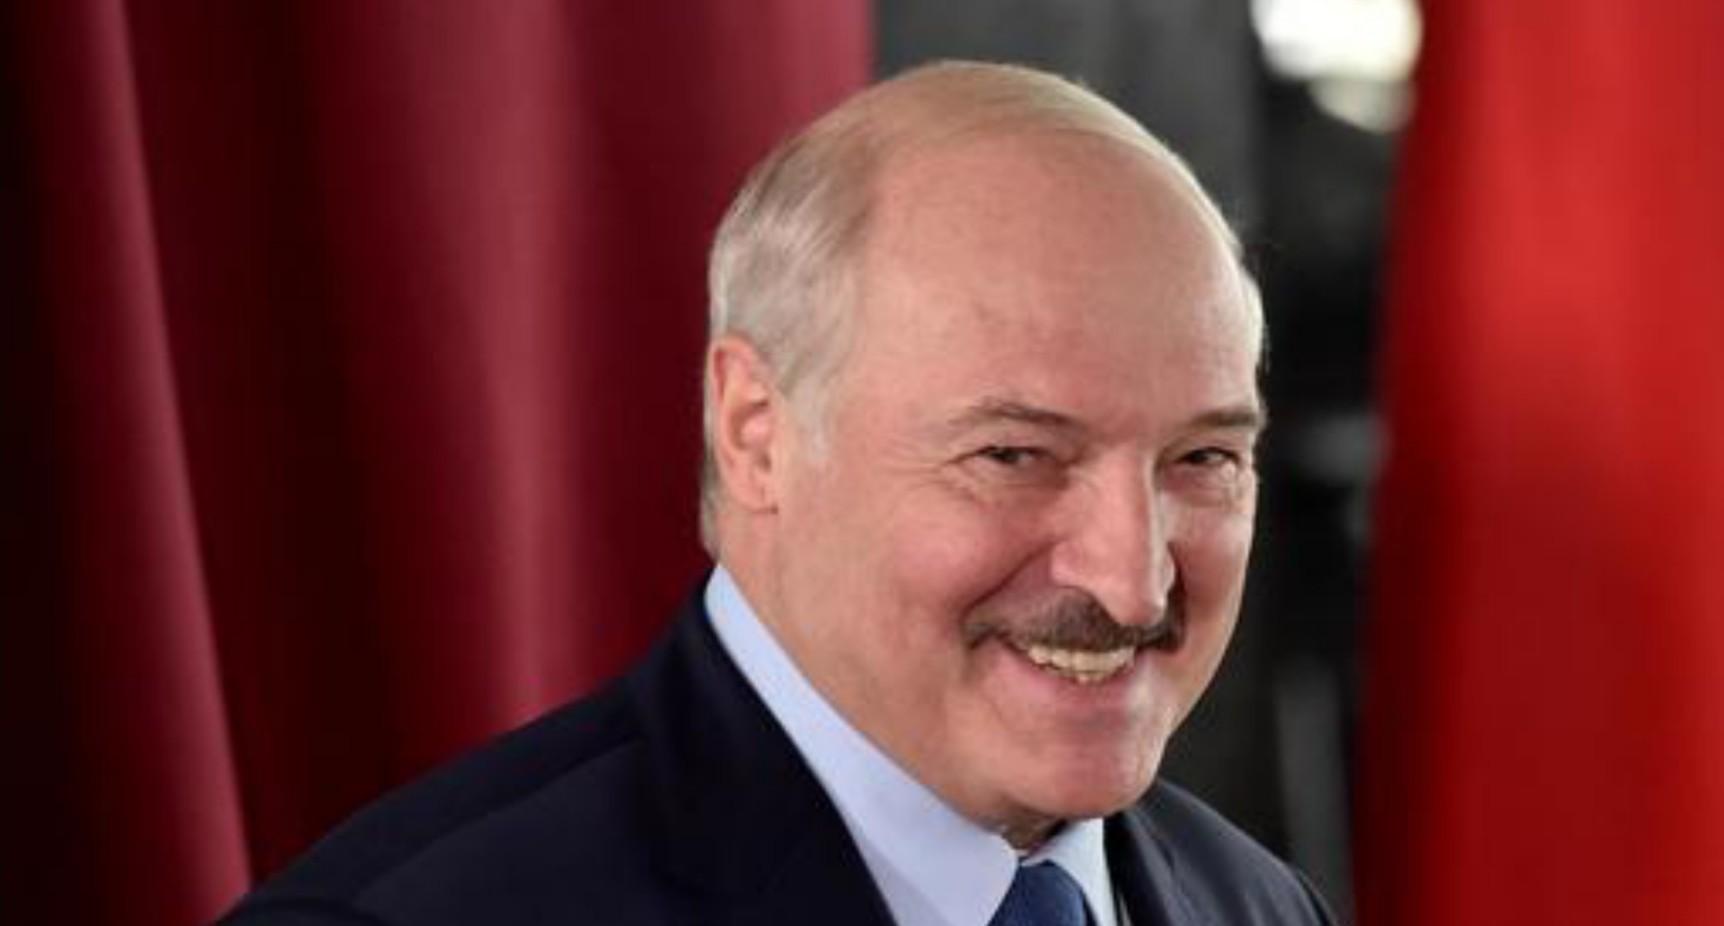 65-year-old Belarus President, Lukashenko wins poll to serve sixth term